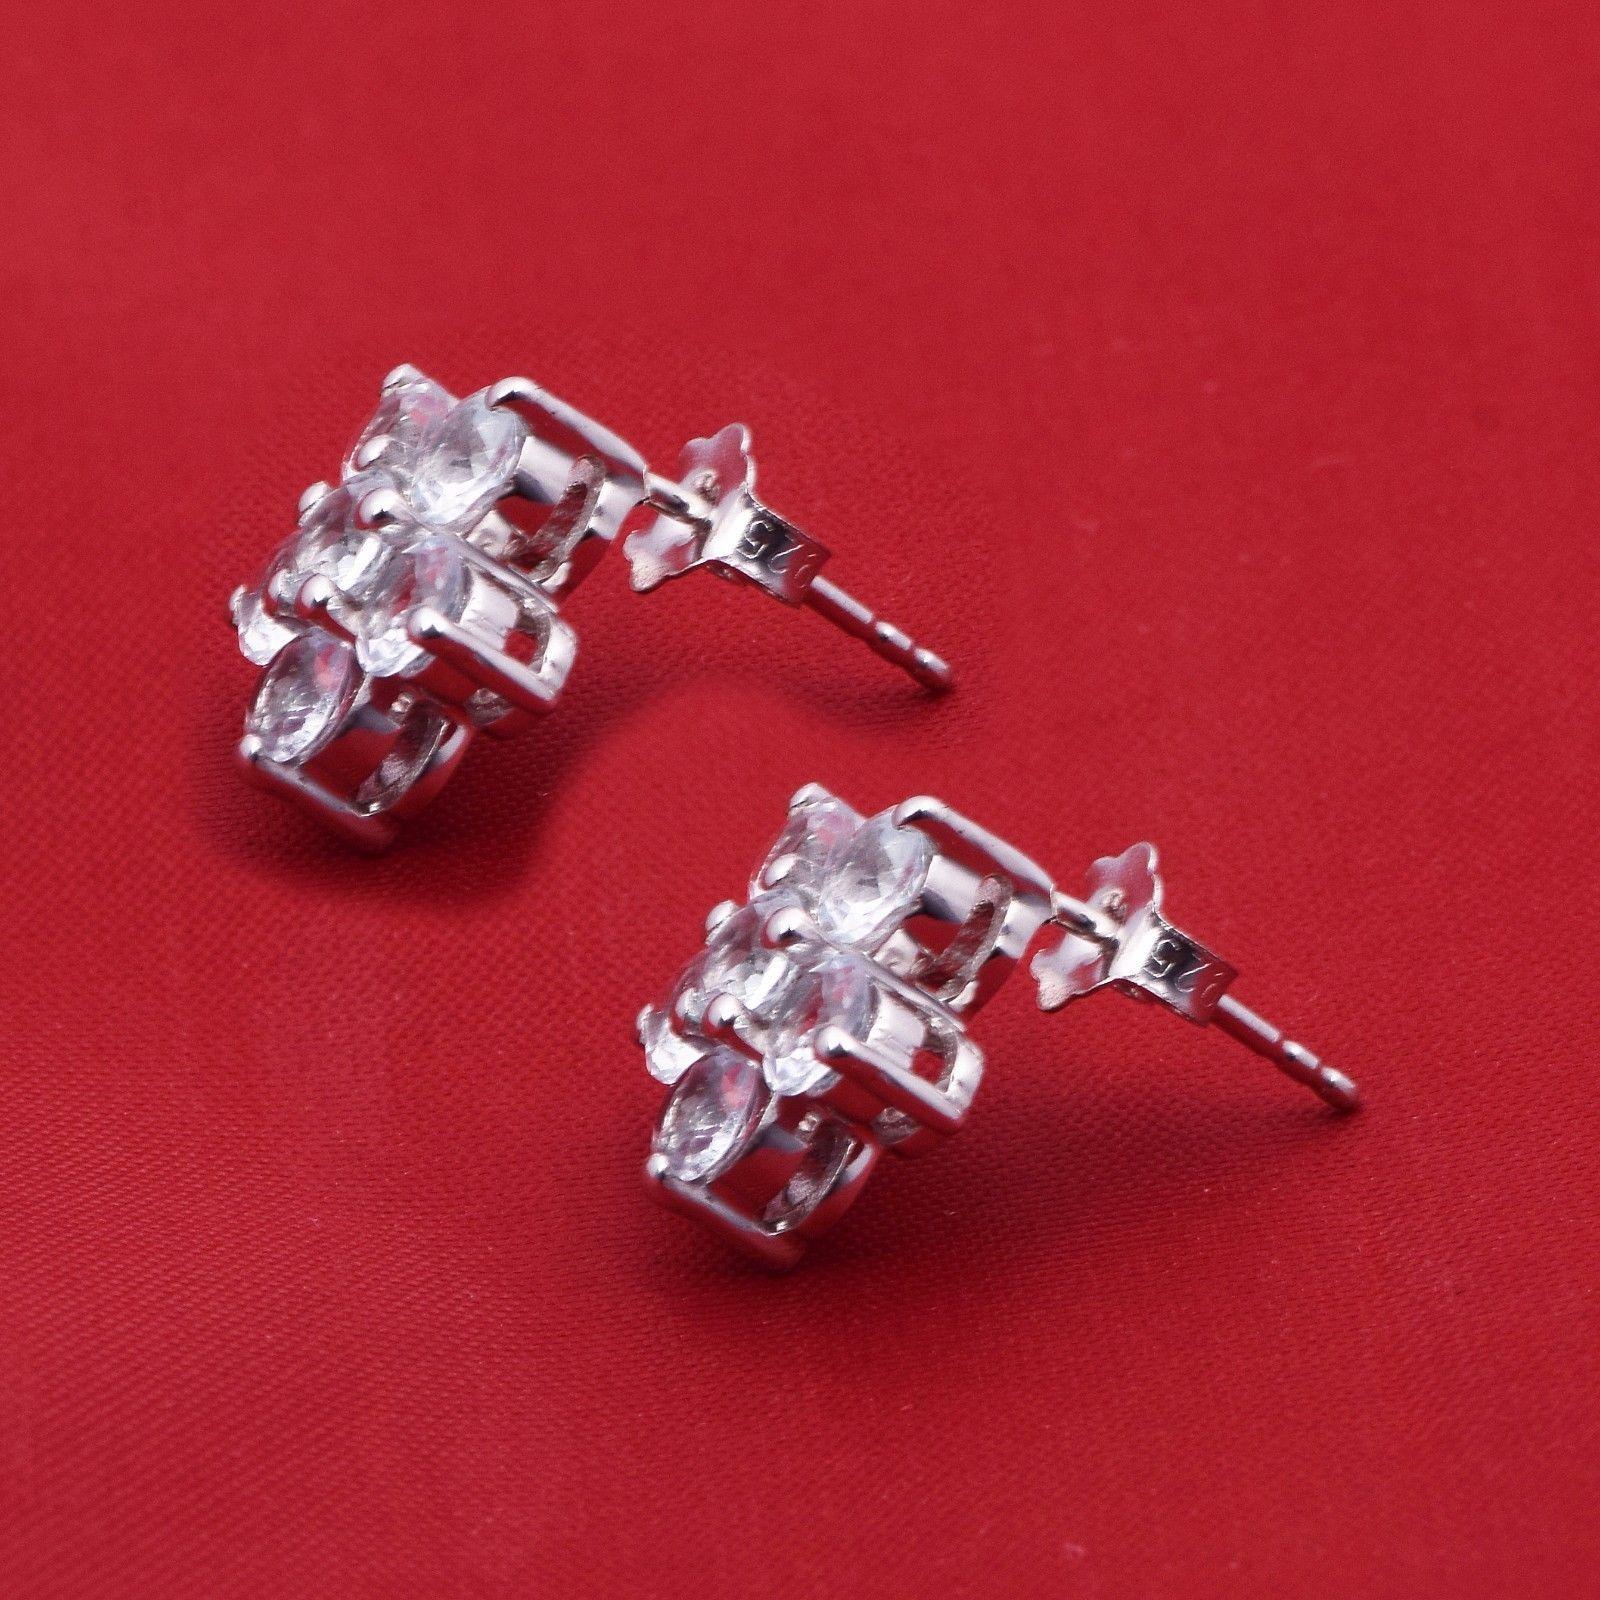 Flower Design Blue Topaz 925 Sterling Silver Earring Shine Jewelry SHER0778